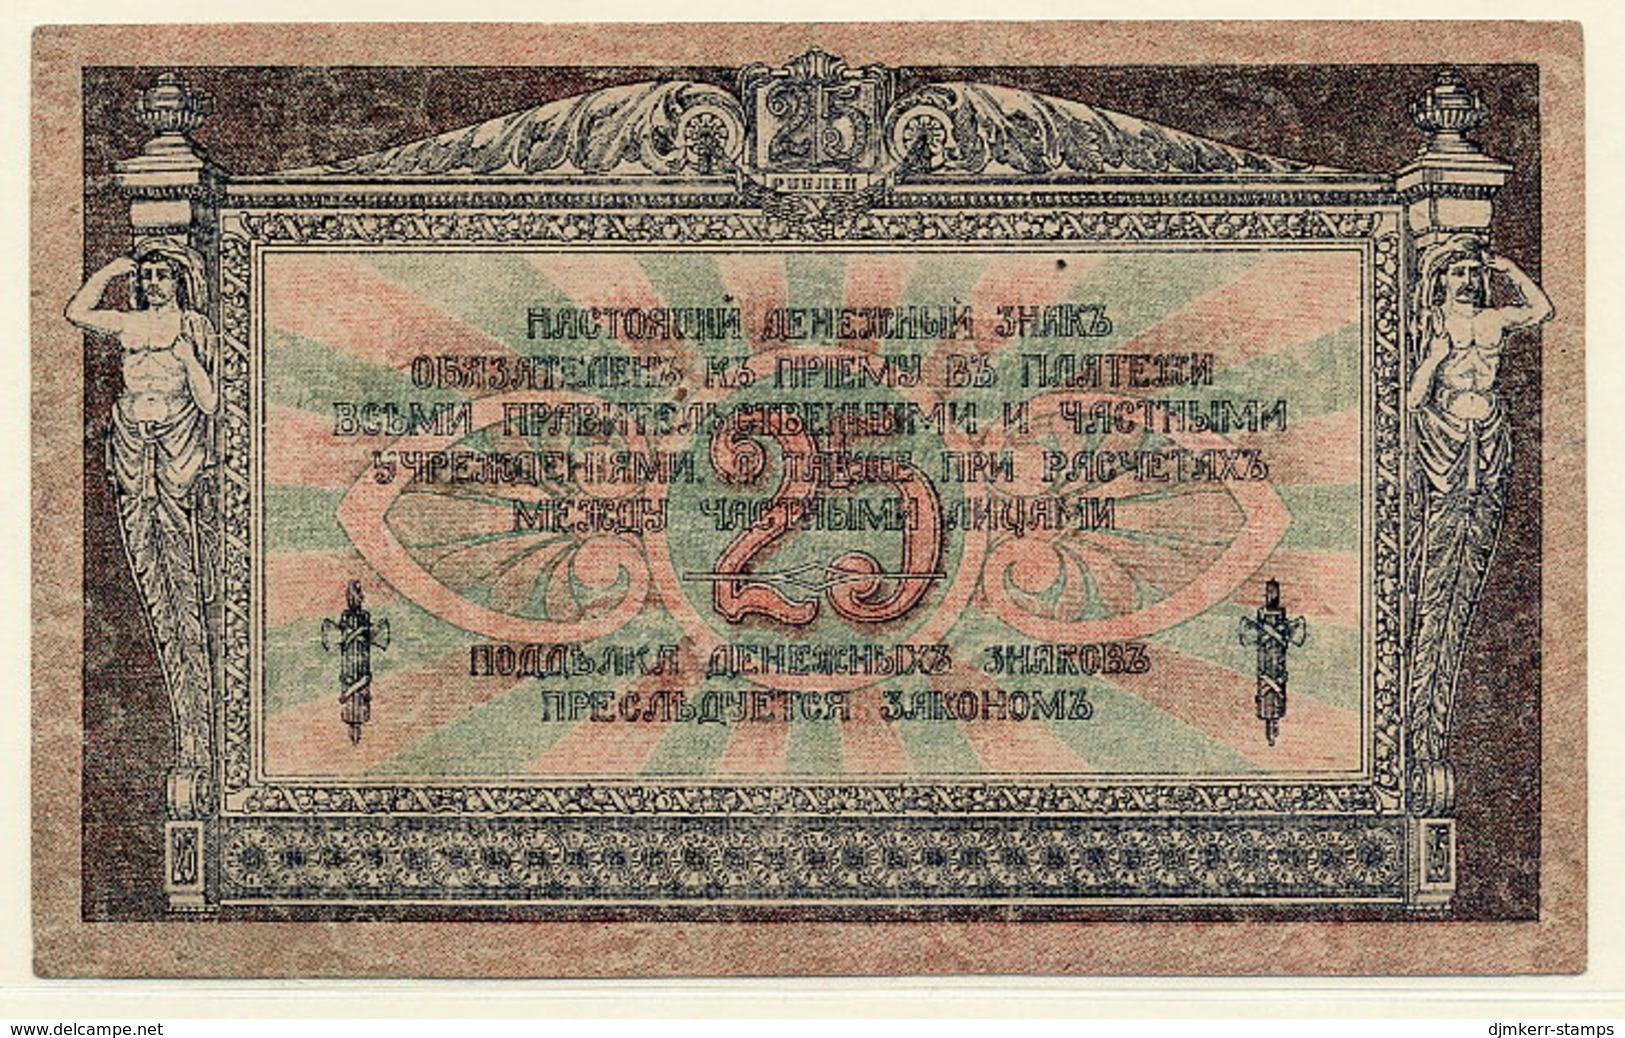 SOUTH RUSSIA 1918  25 Rubles VF  S412b (monogram Watermark) - Russia